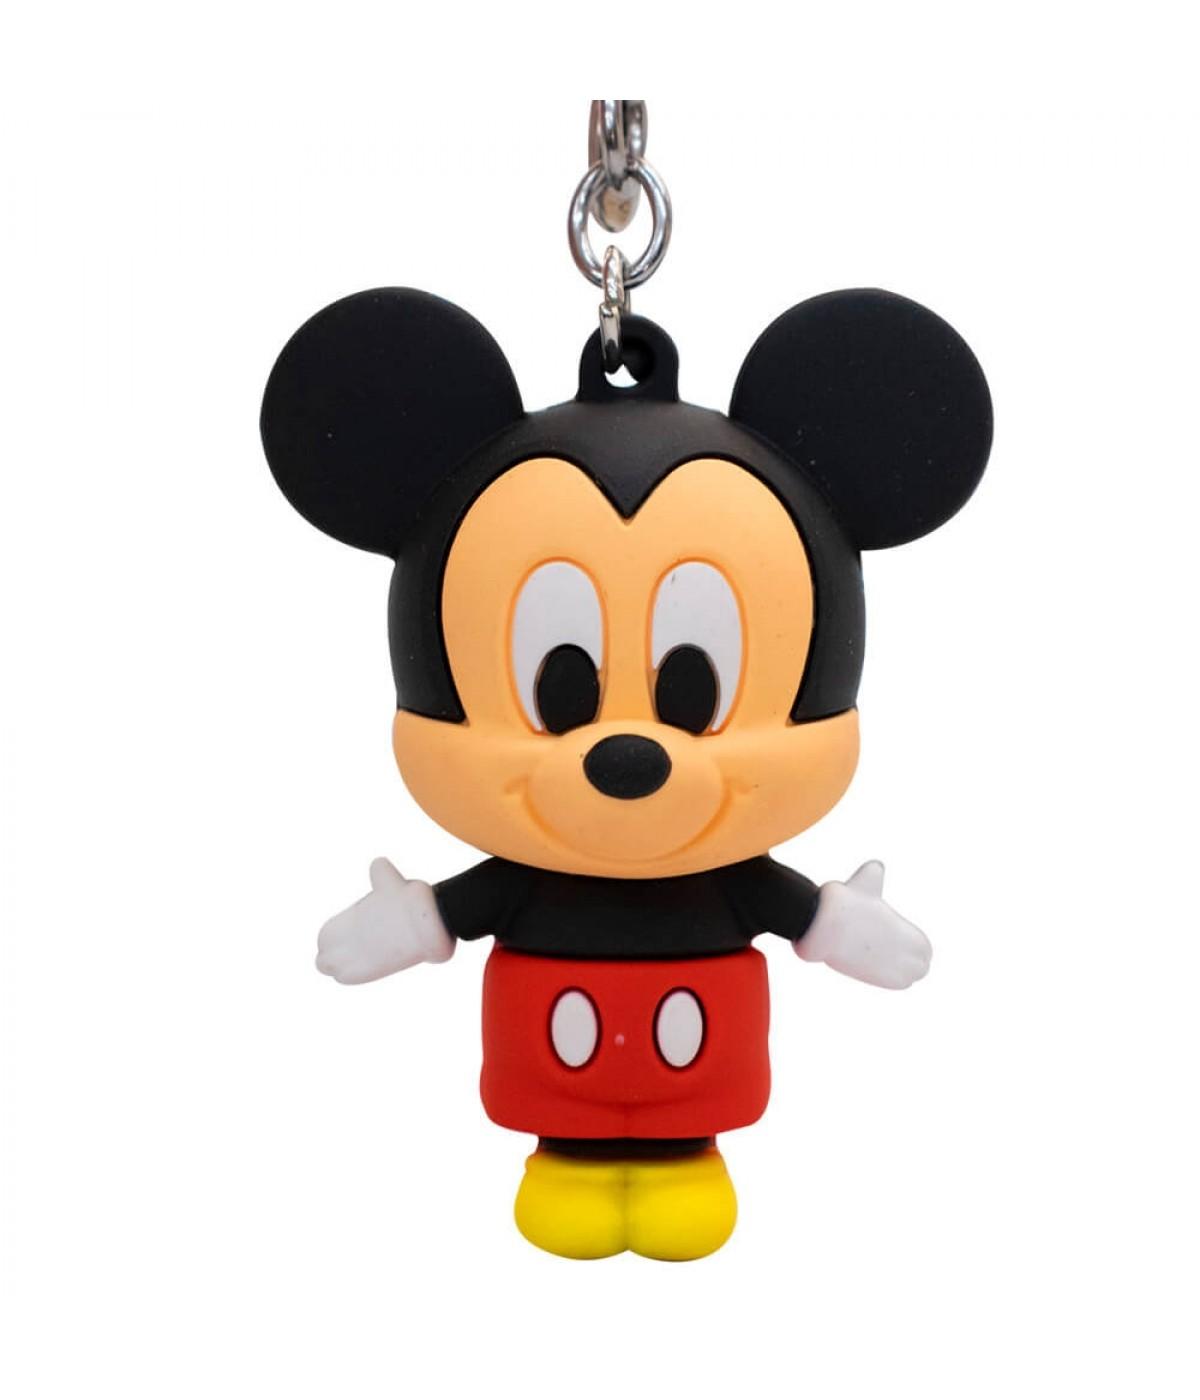 Chaveiro Formato Mickey Mouse 6cm - Disney